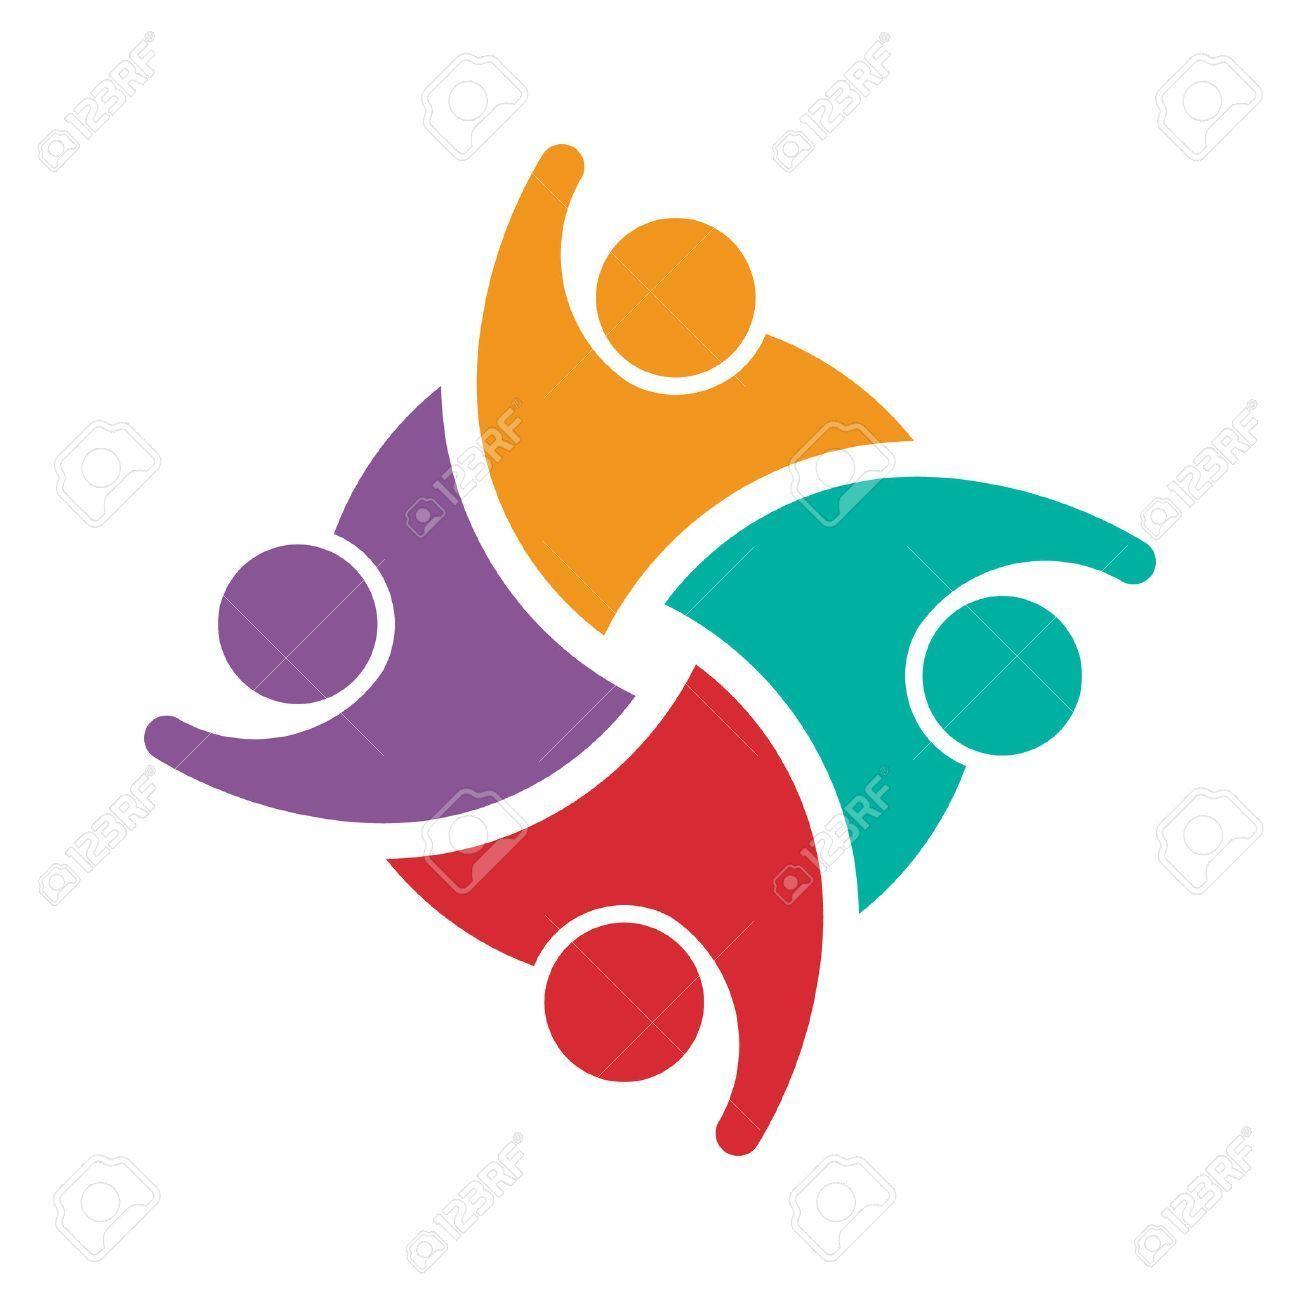 00b4729298a2 Teamwork of 4 swoosh people. Concept of group of people collaboration..   people  group  teamwork  family  children  kids  team  meeting  business   partner ...